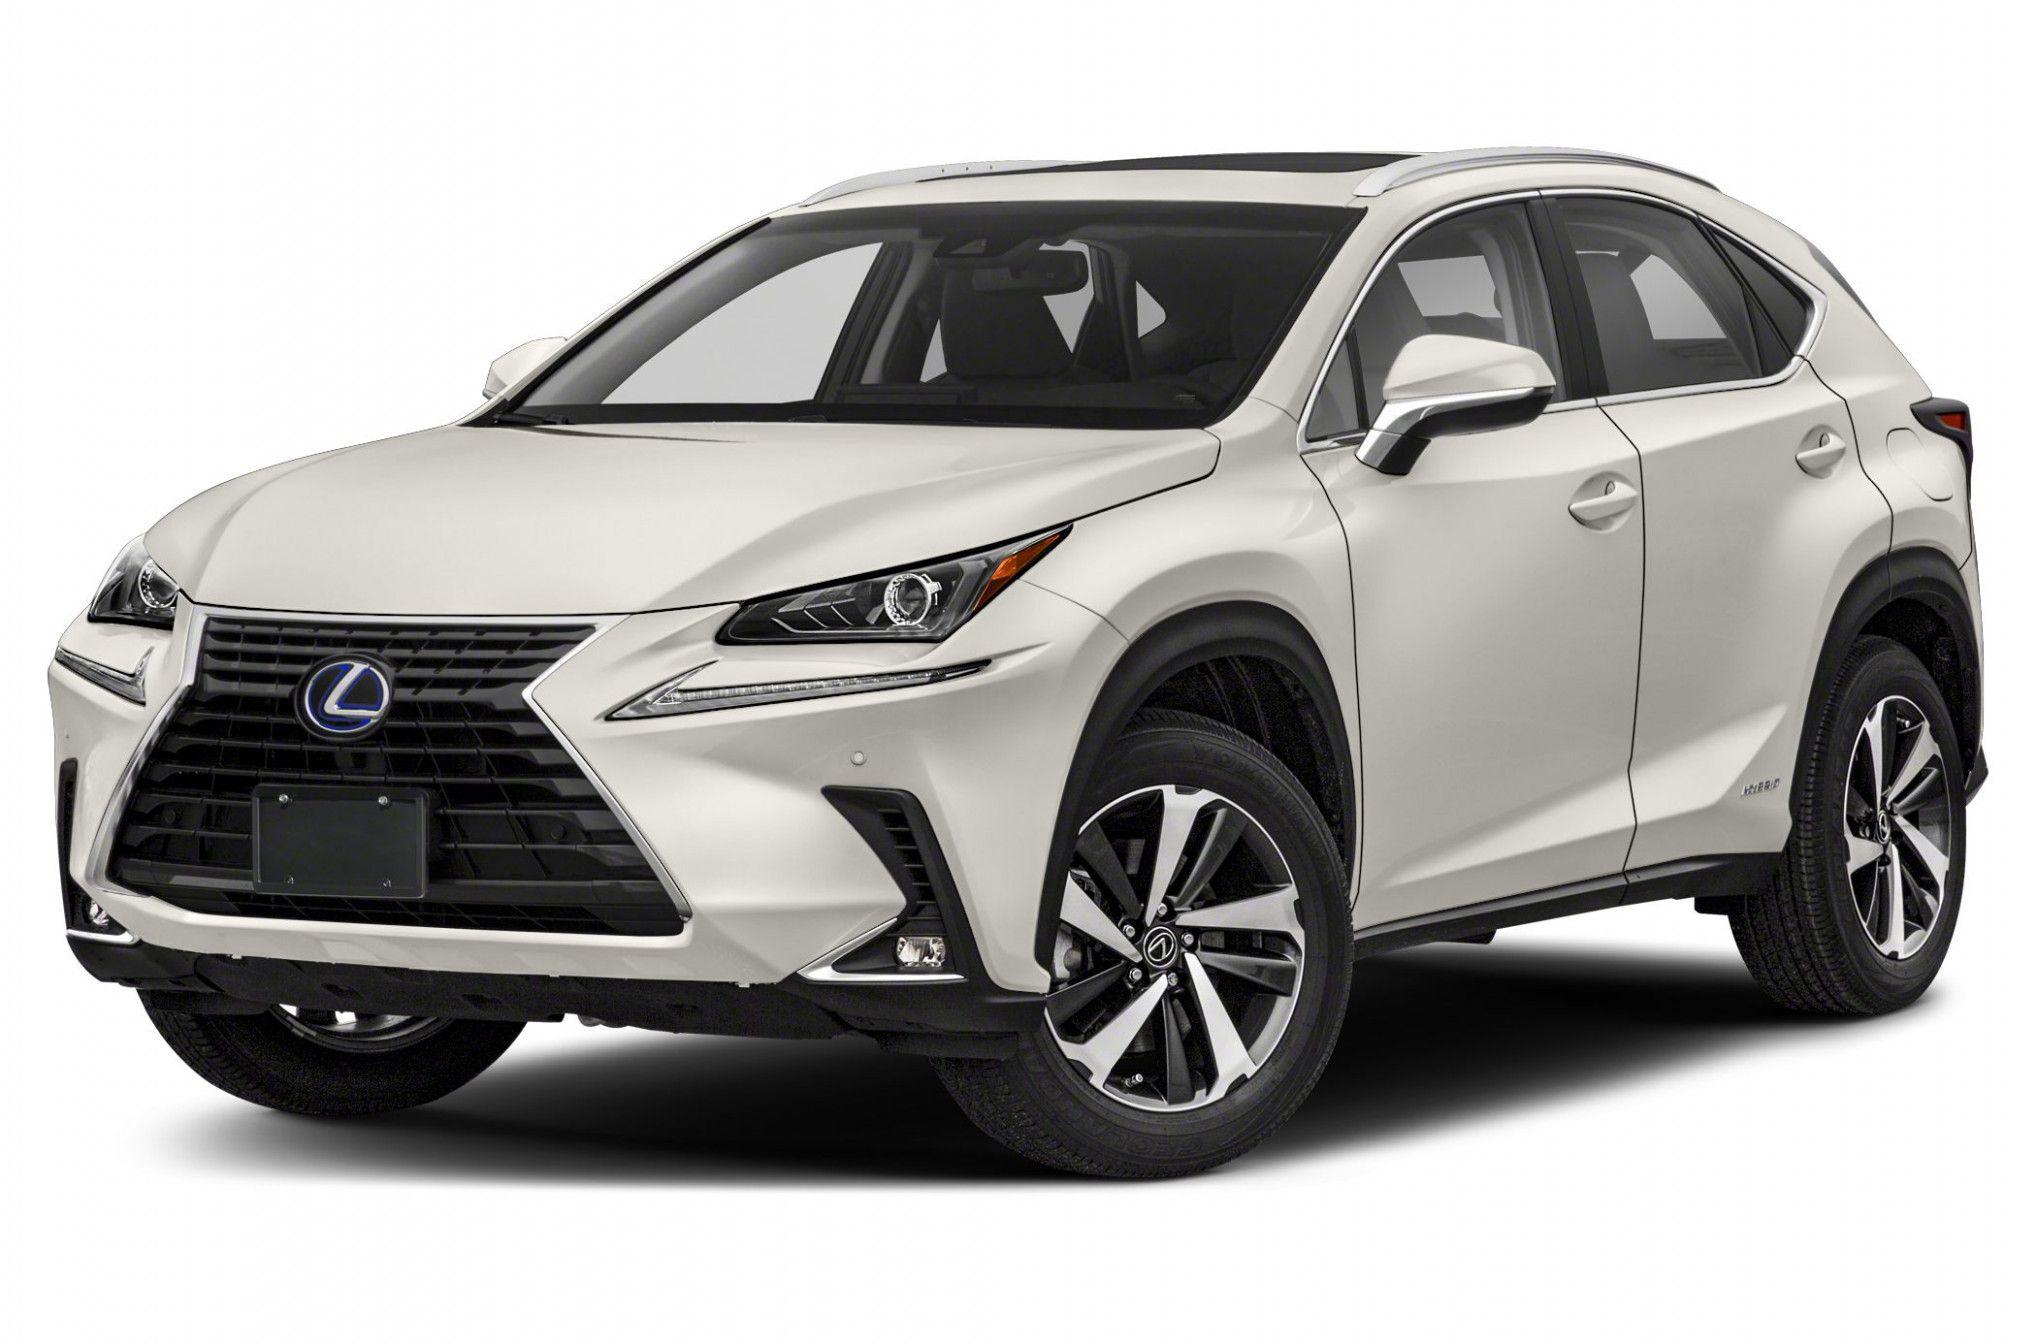 Subaru Impreza 2021 Lexus suv, Lexus, Lexus nx 200t